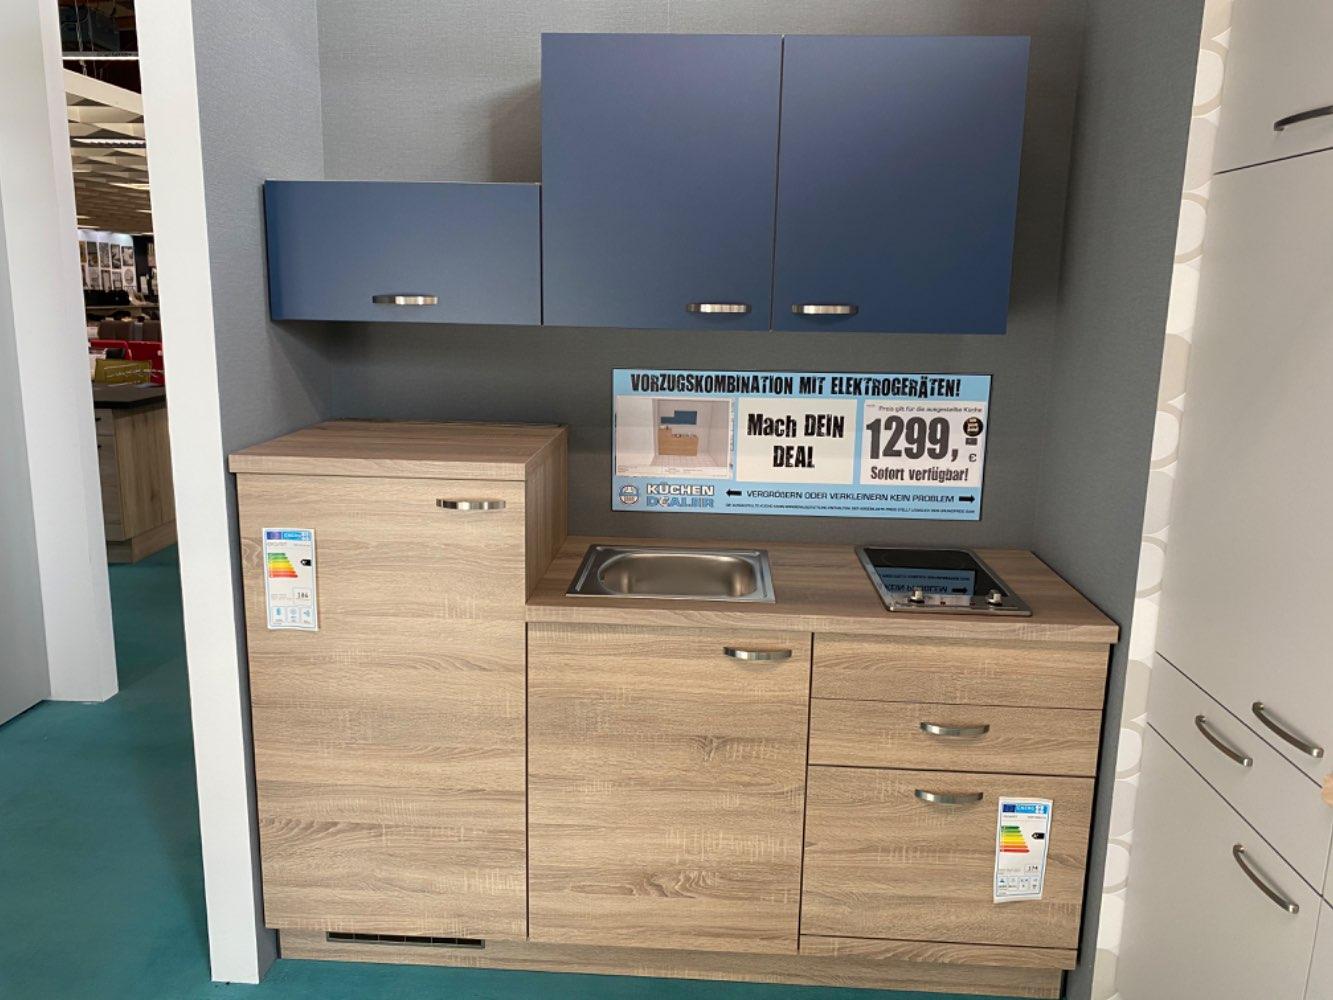 Einbauküche / Küche mit E-Geräten Top Deal Koje 23a